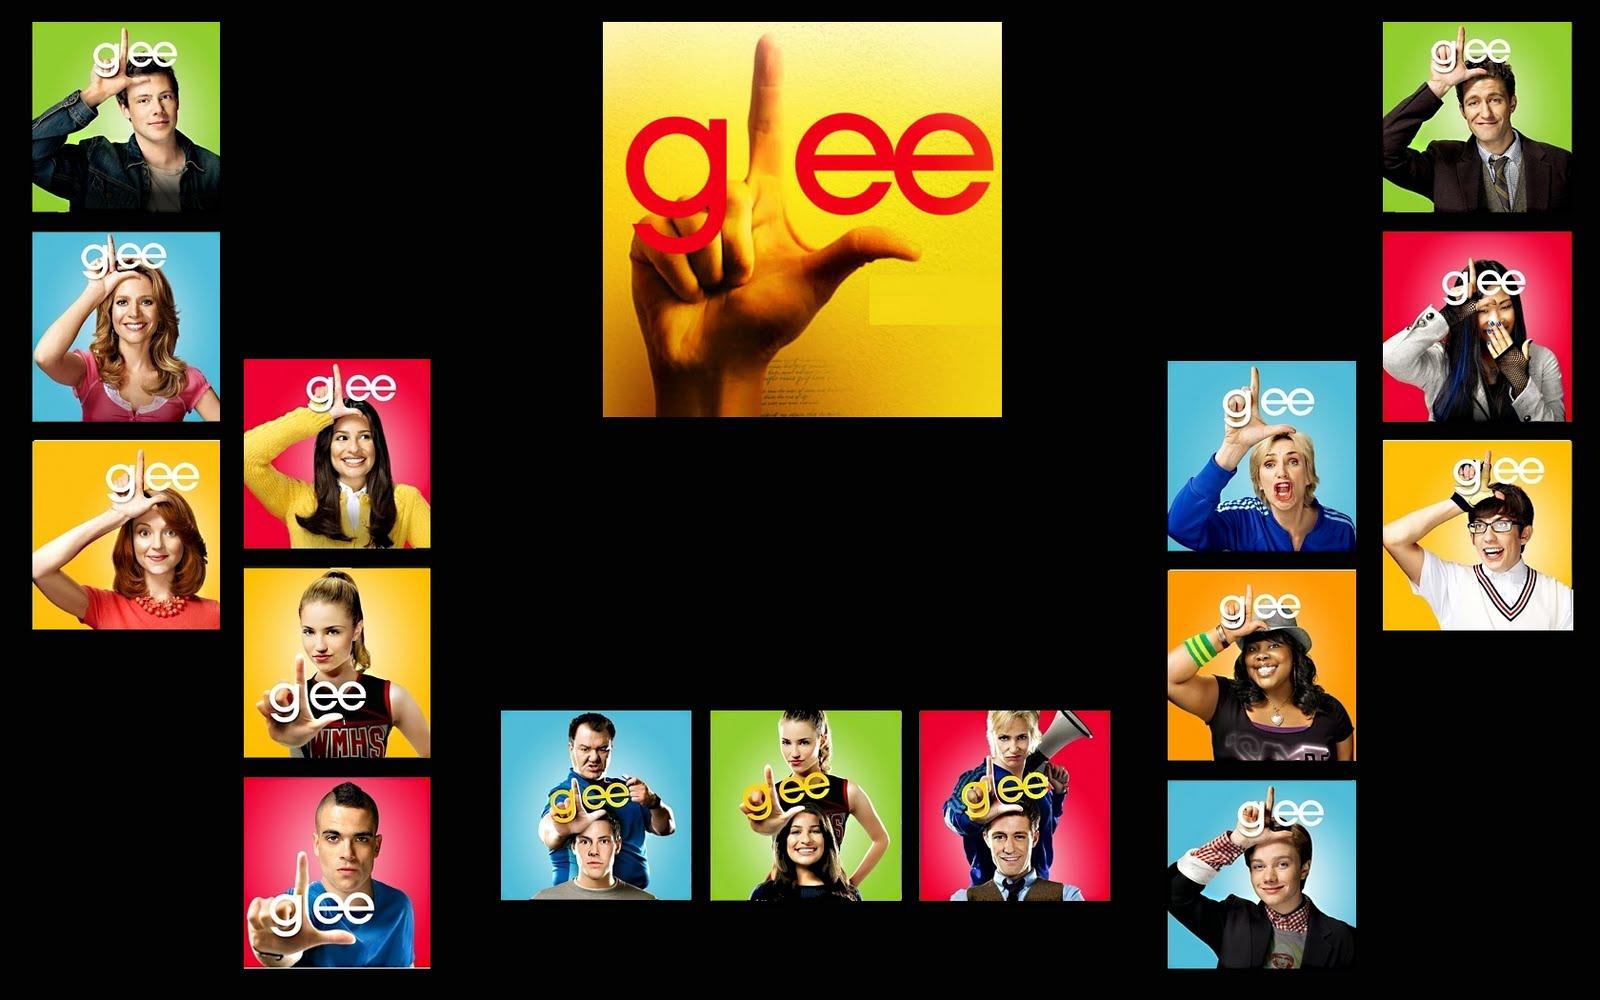 http://1.bp.blogspot.com/_2_UP4DuuNxE/TE84KbjC7cI/AAAAAAAADuc/yiEpQSXsp98/s1600/Glee2.jpg